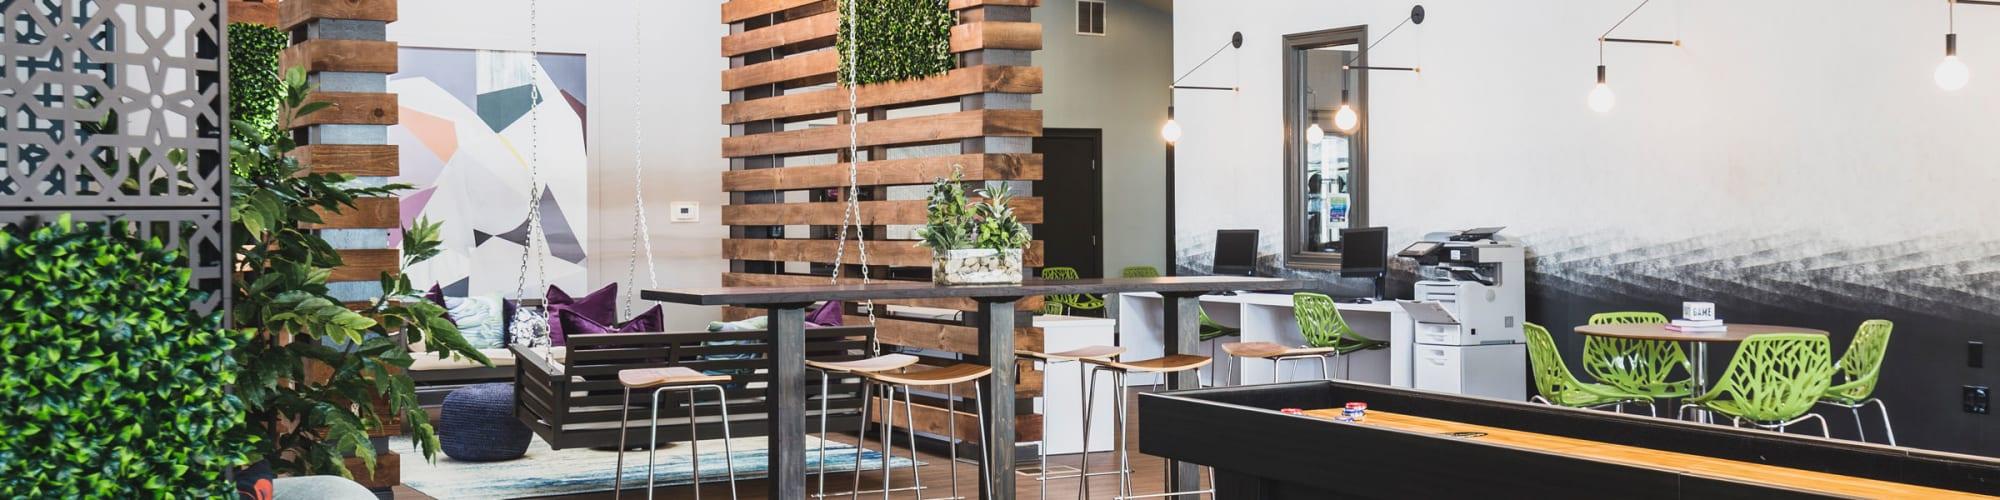 Reviews of Salem Wood Apartments in Salem, Virginia